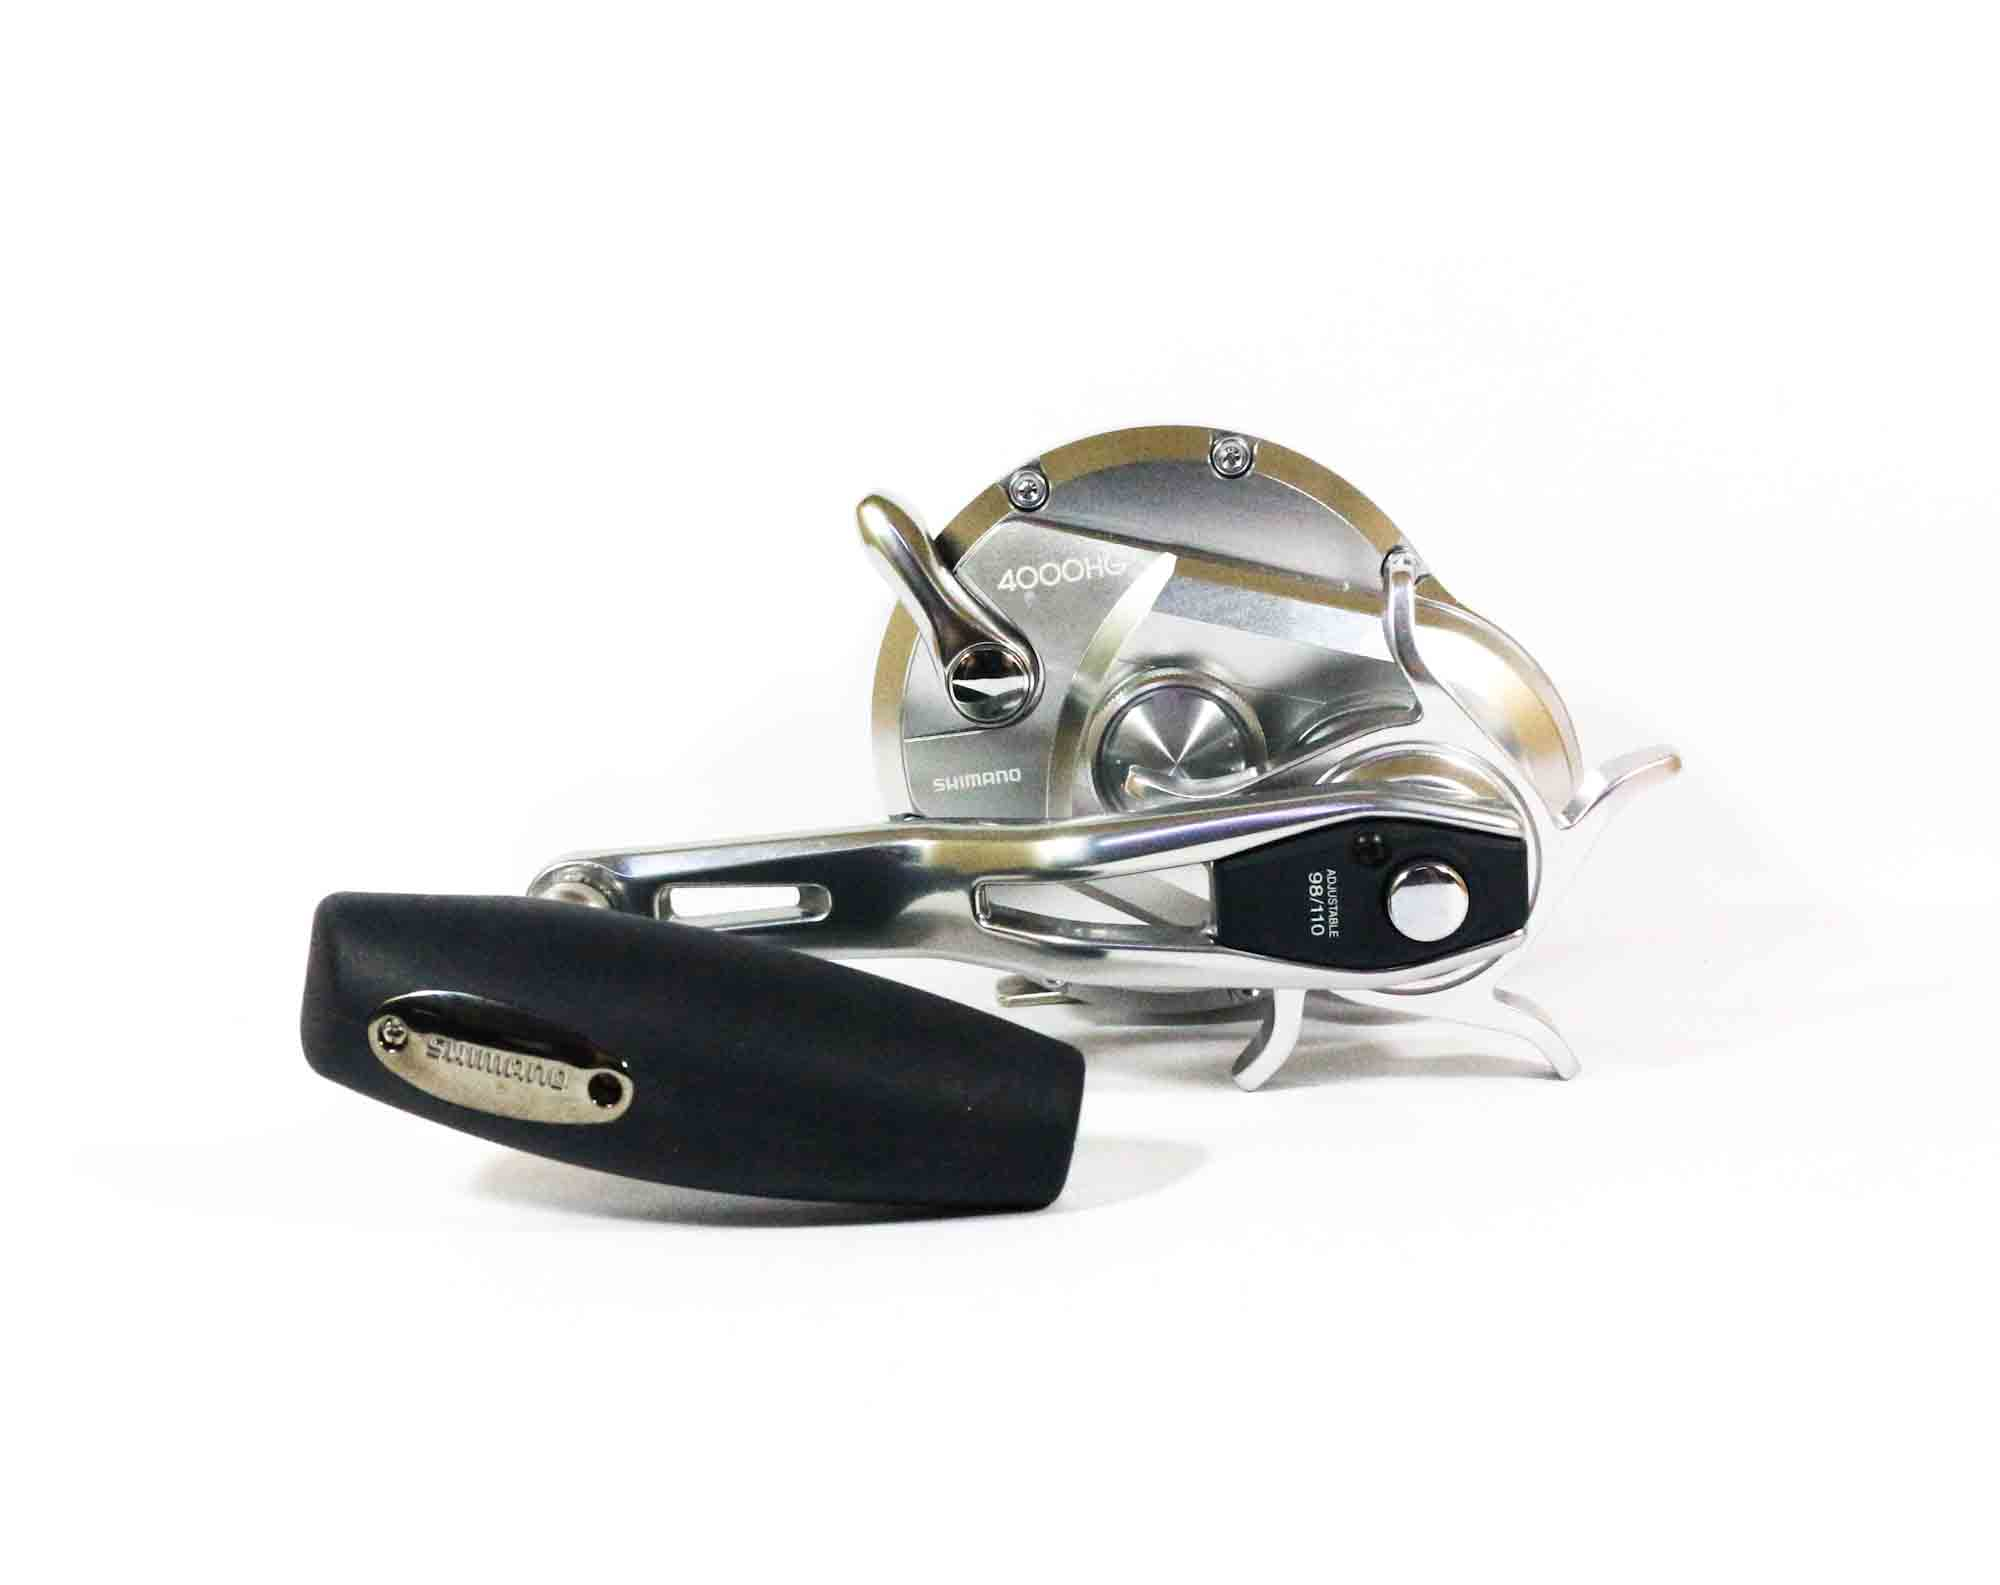 Shimano Reel Baitcast Ocea Jigger 4000 HG Right Hand (0671)